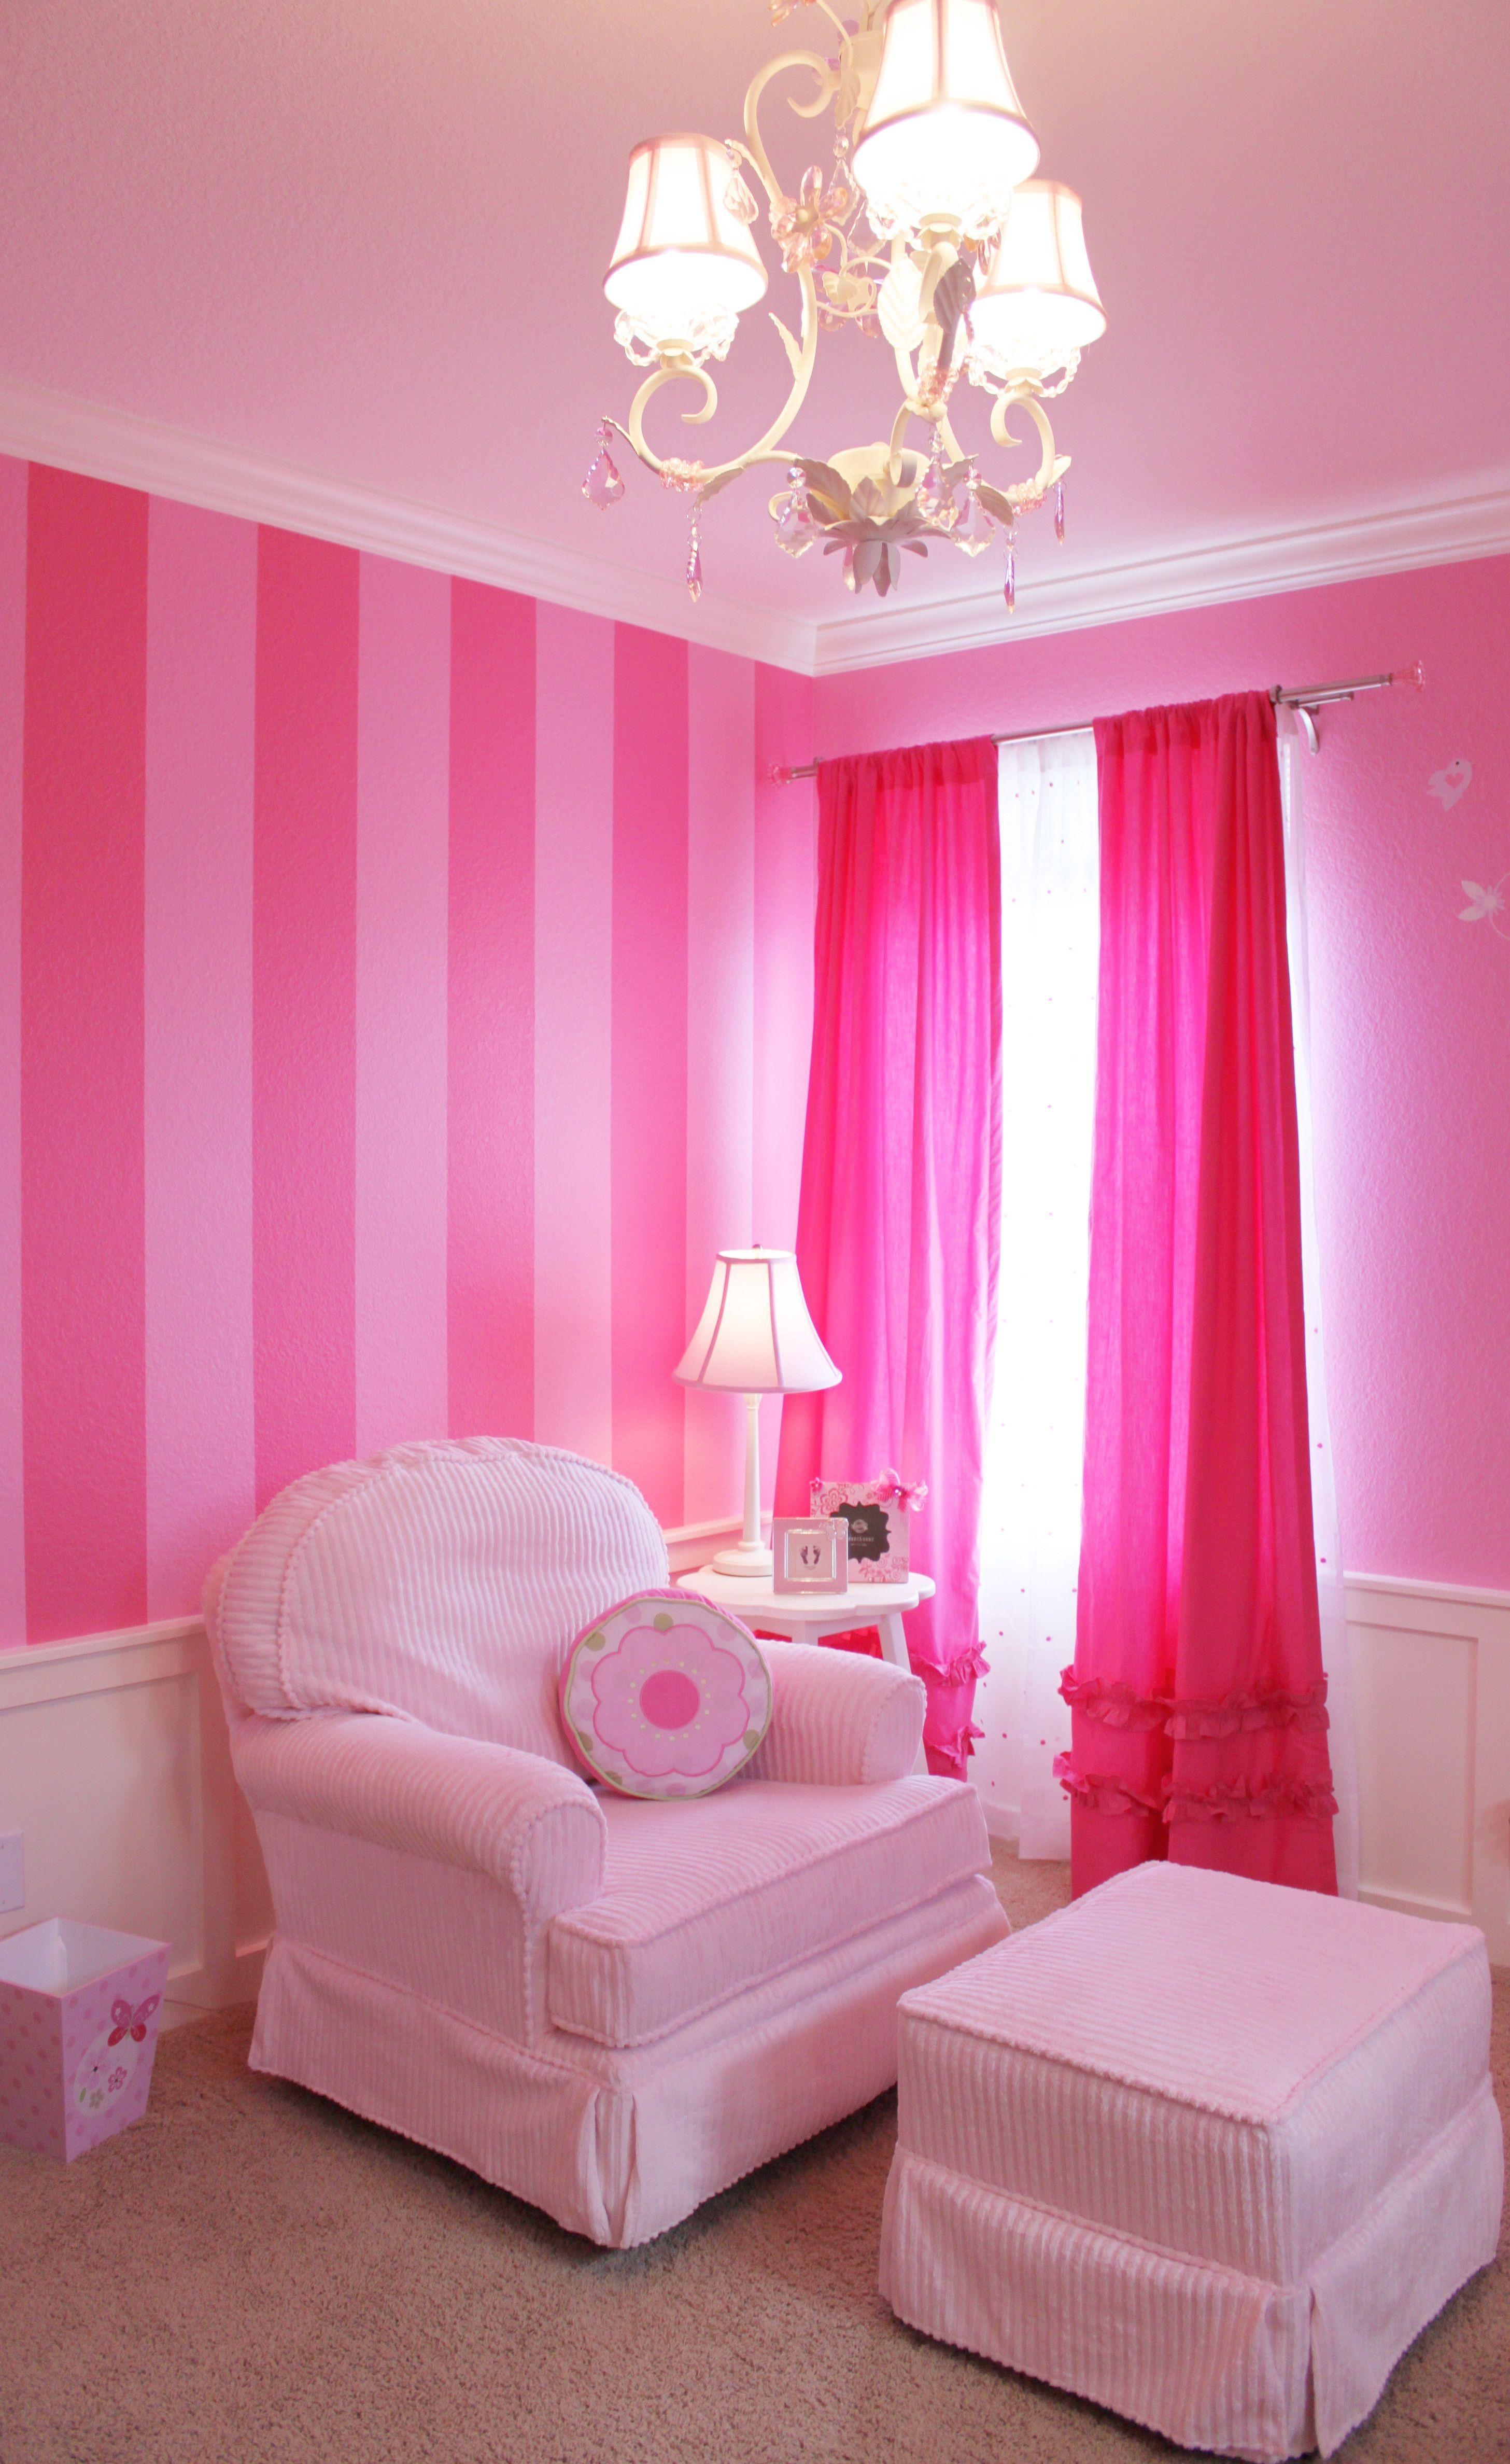 Cool Wall Paint Idea Nursery Pink Bedroom Walls Pink ...